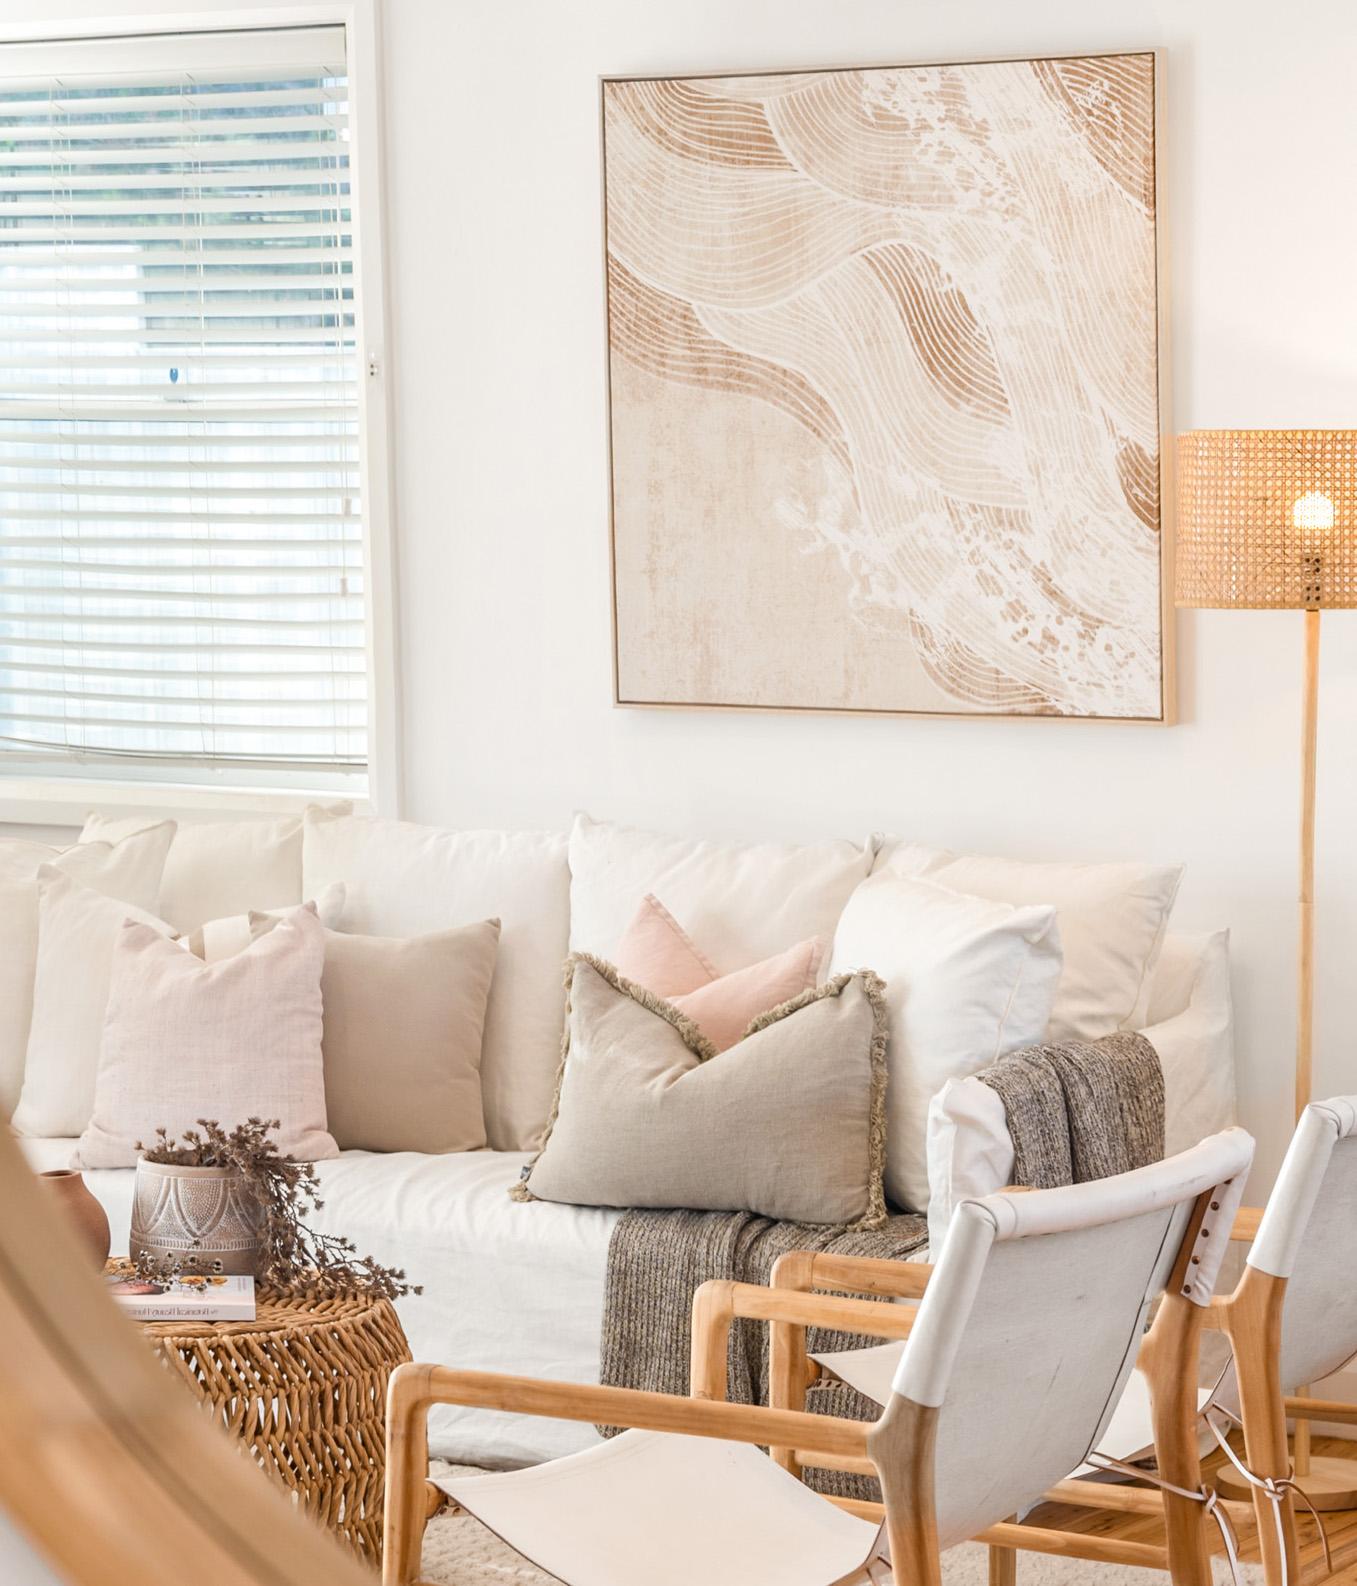 Styled lounge